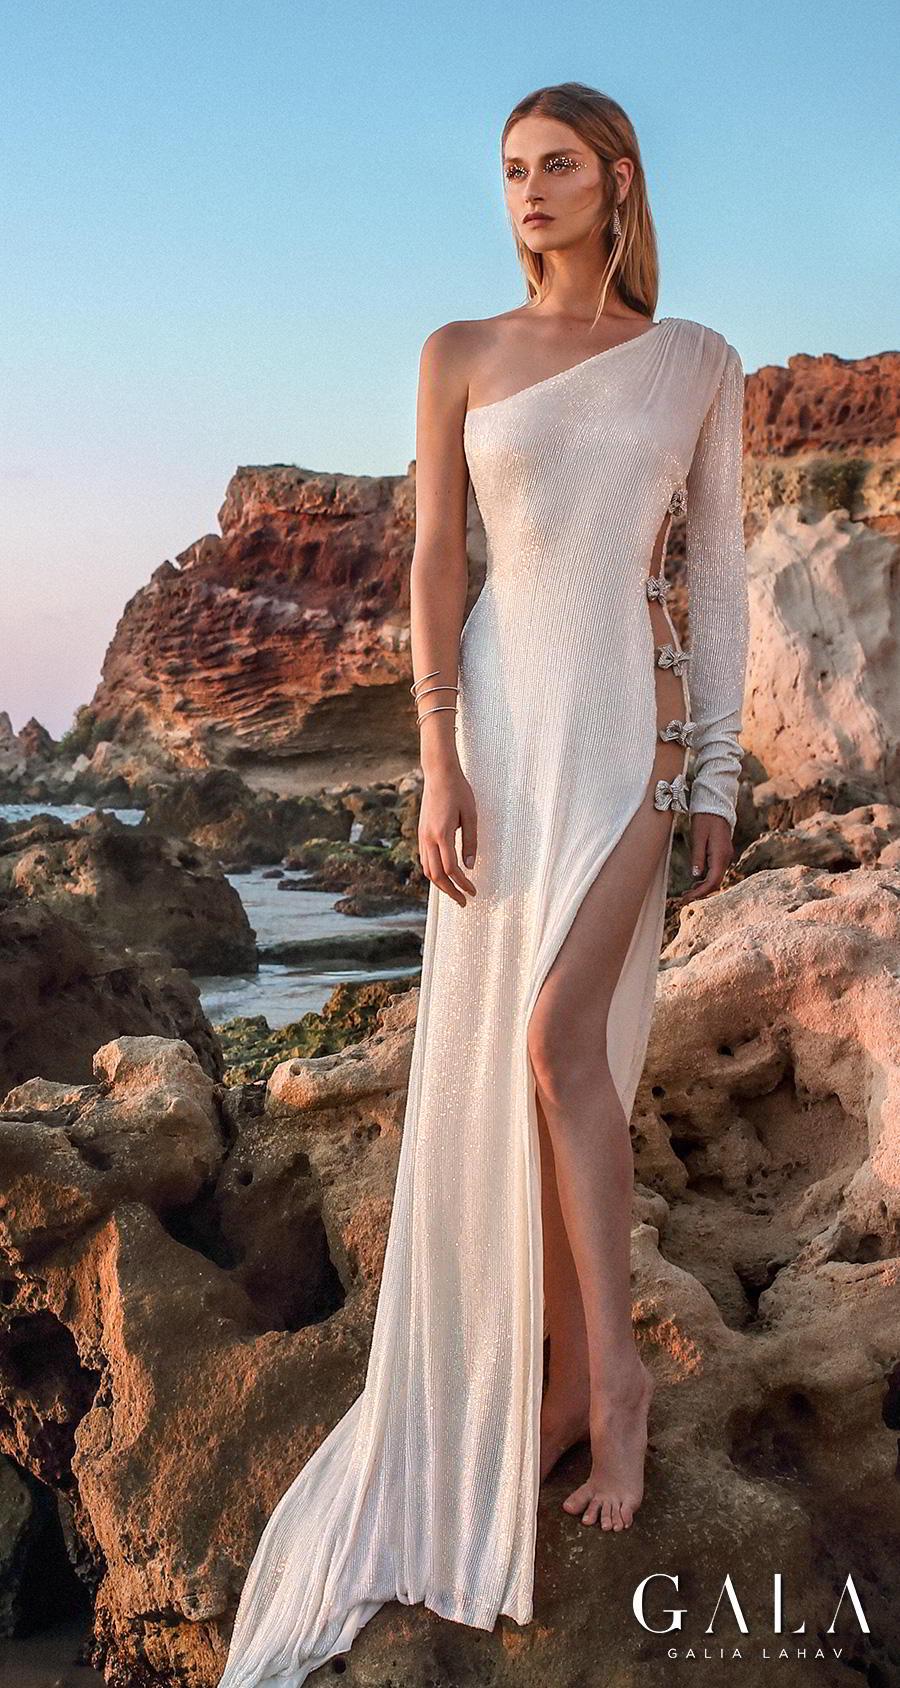 galia lahav fall 2020 gala no 9 bridal one shoulder asymmetrical neckline simple shimmering elegant sexy slit skirt sheath wedding dress backless cowl back medium train (406) mv